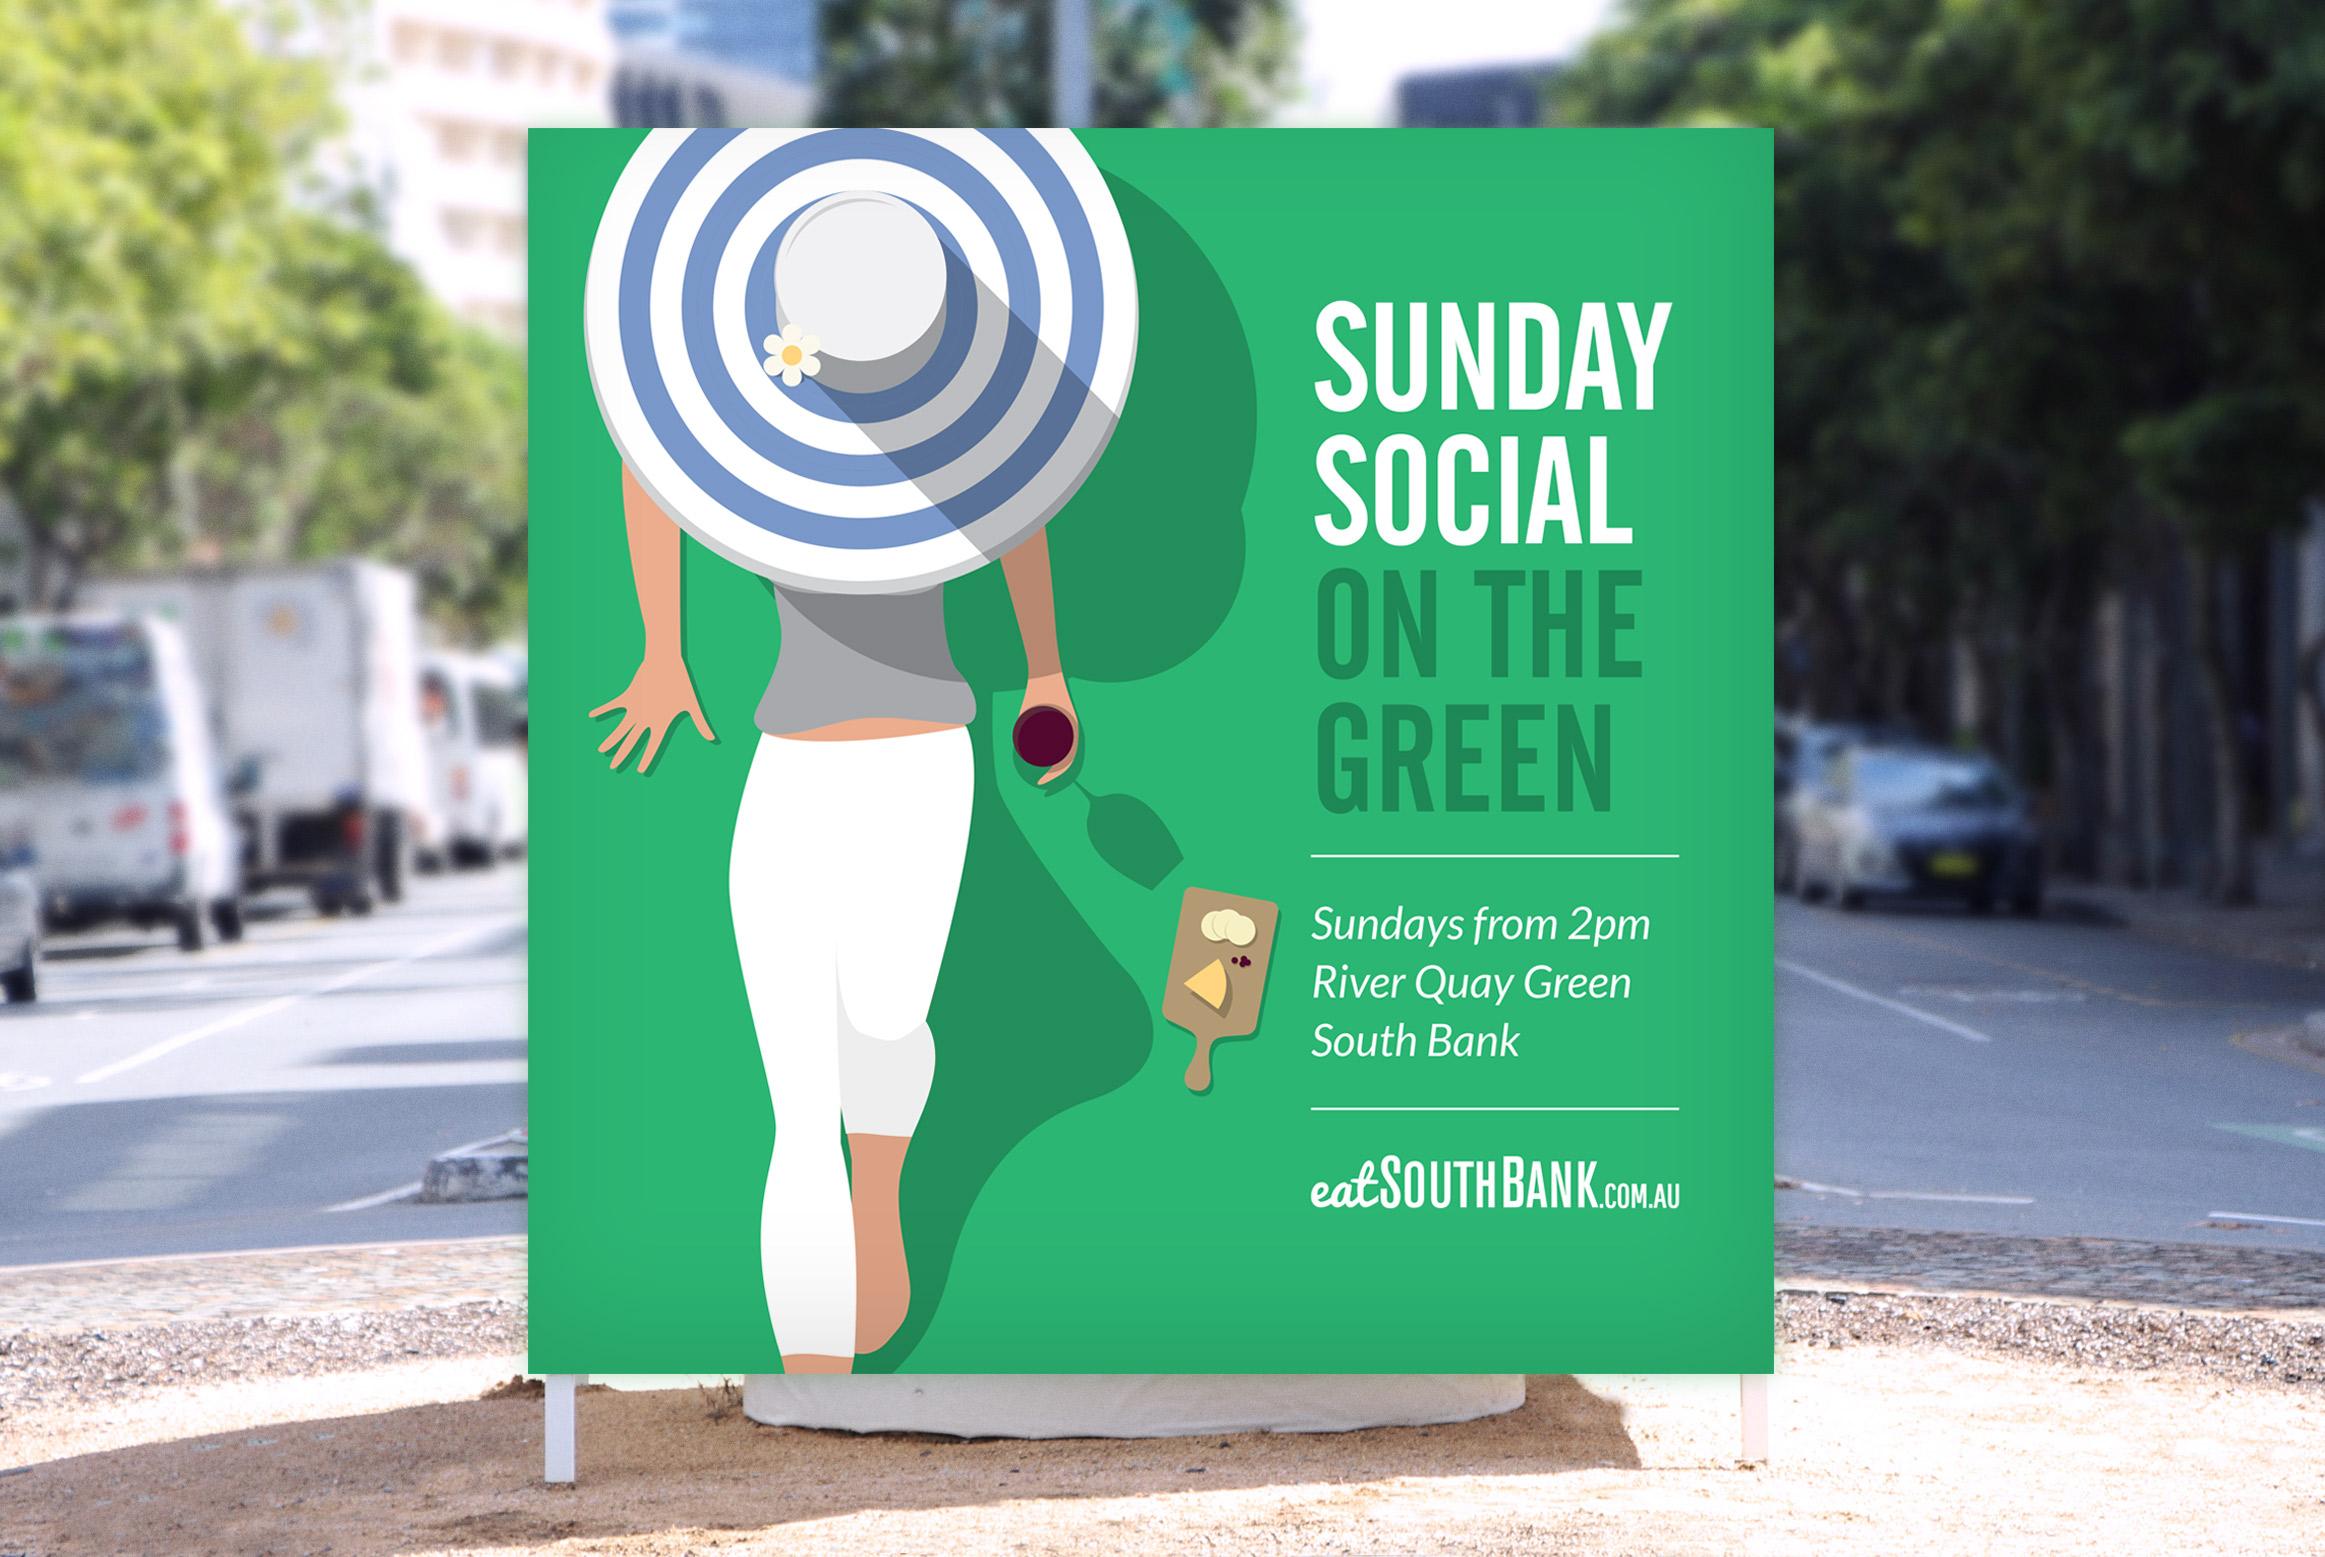 sunday social on the green